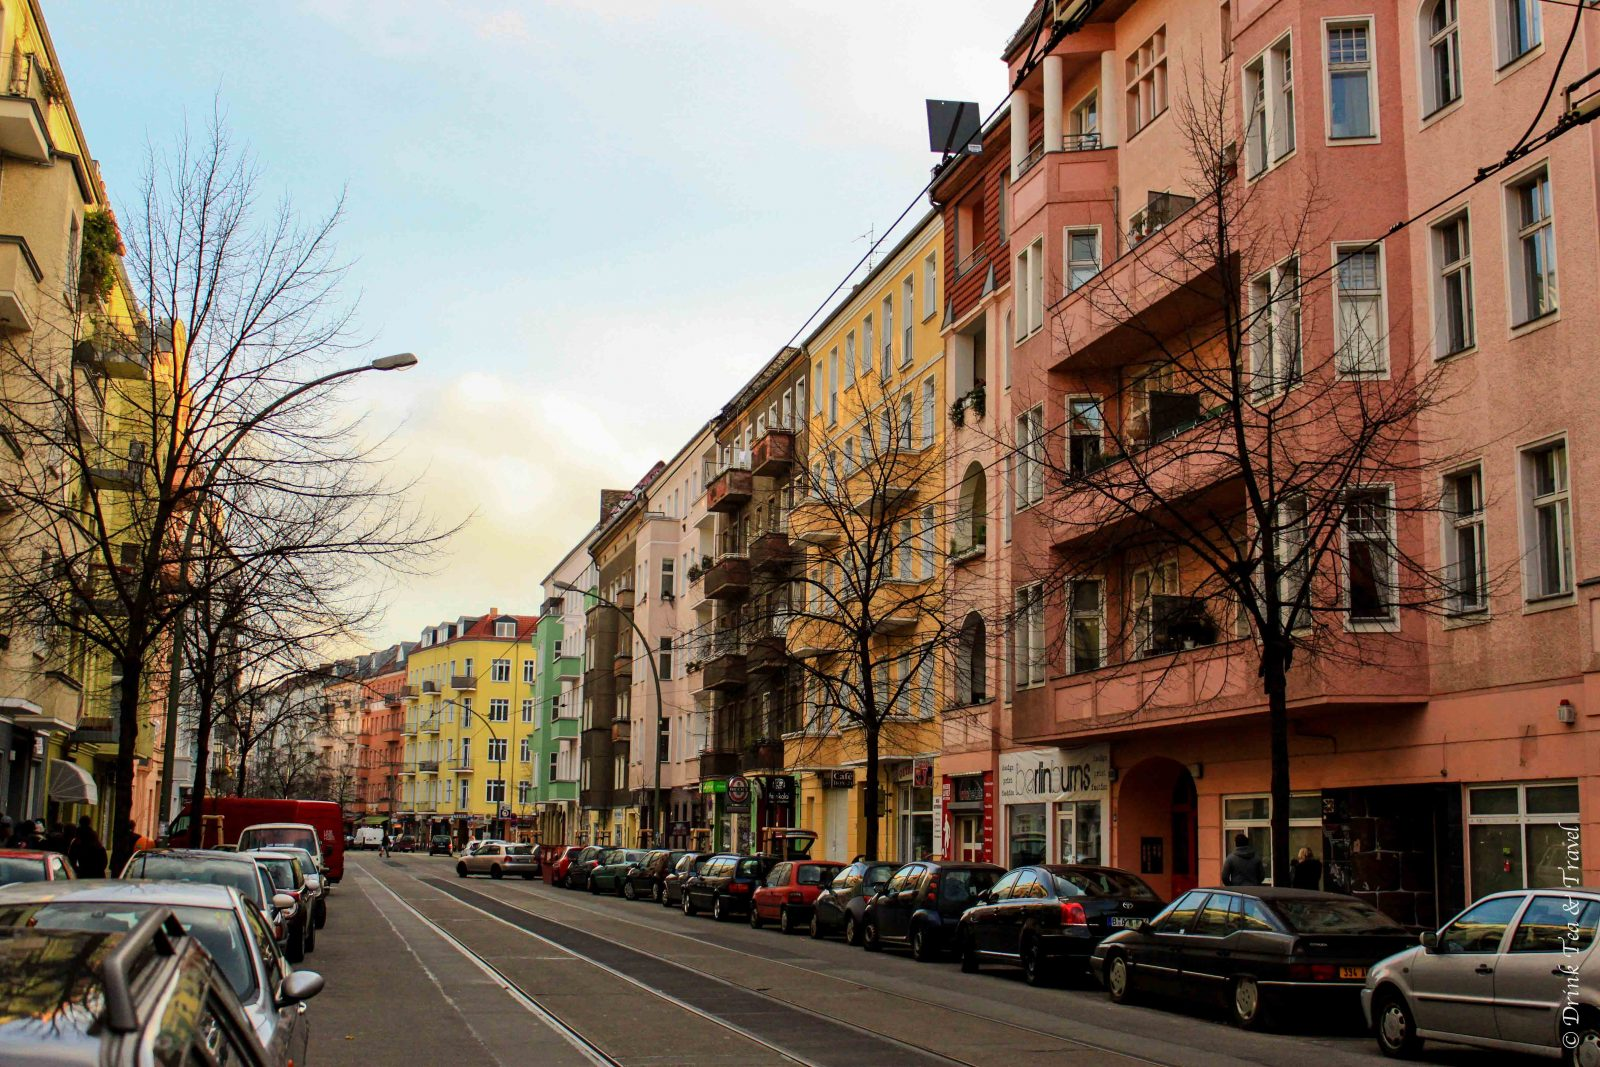 Europe Itinerary: Alternative Berlin, Germany